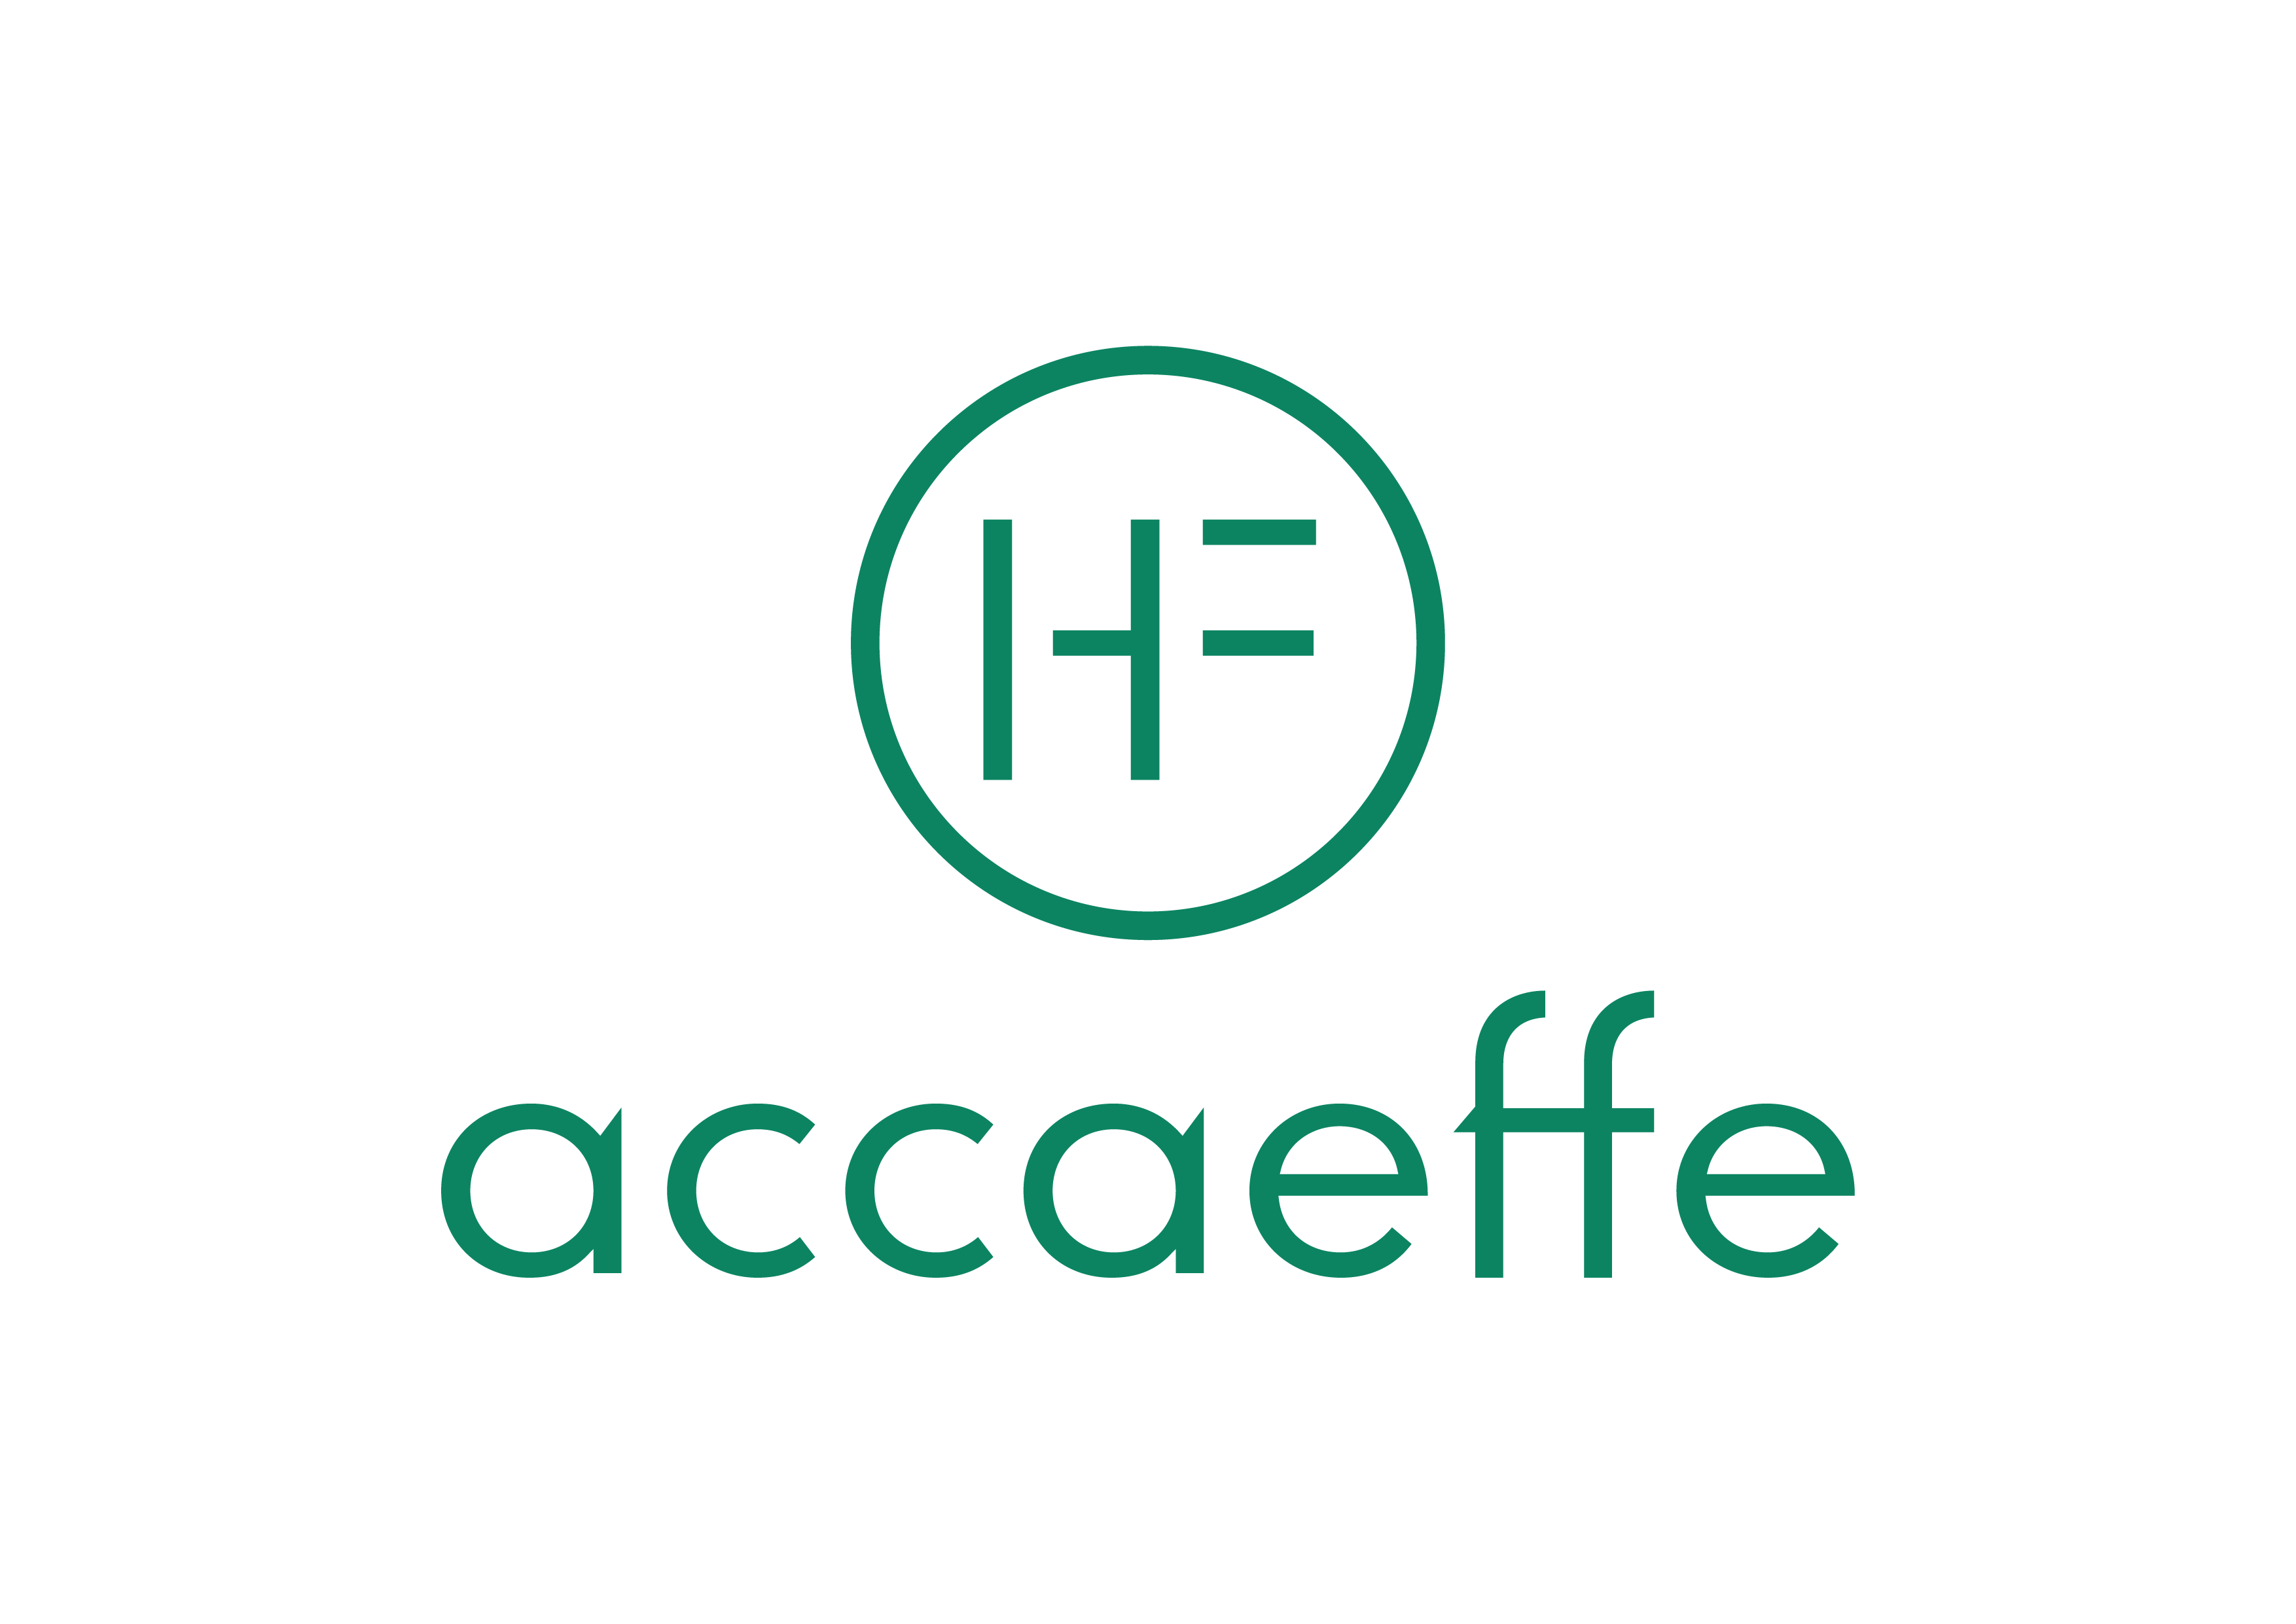 Accaeffe